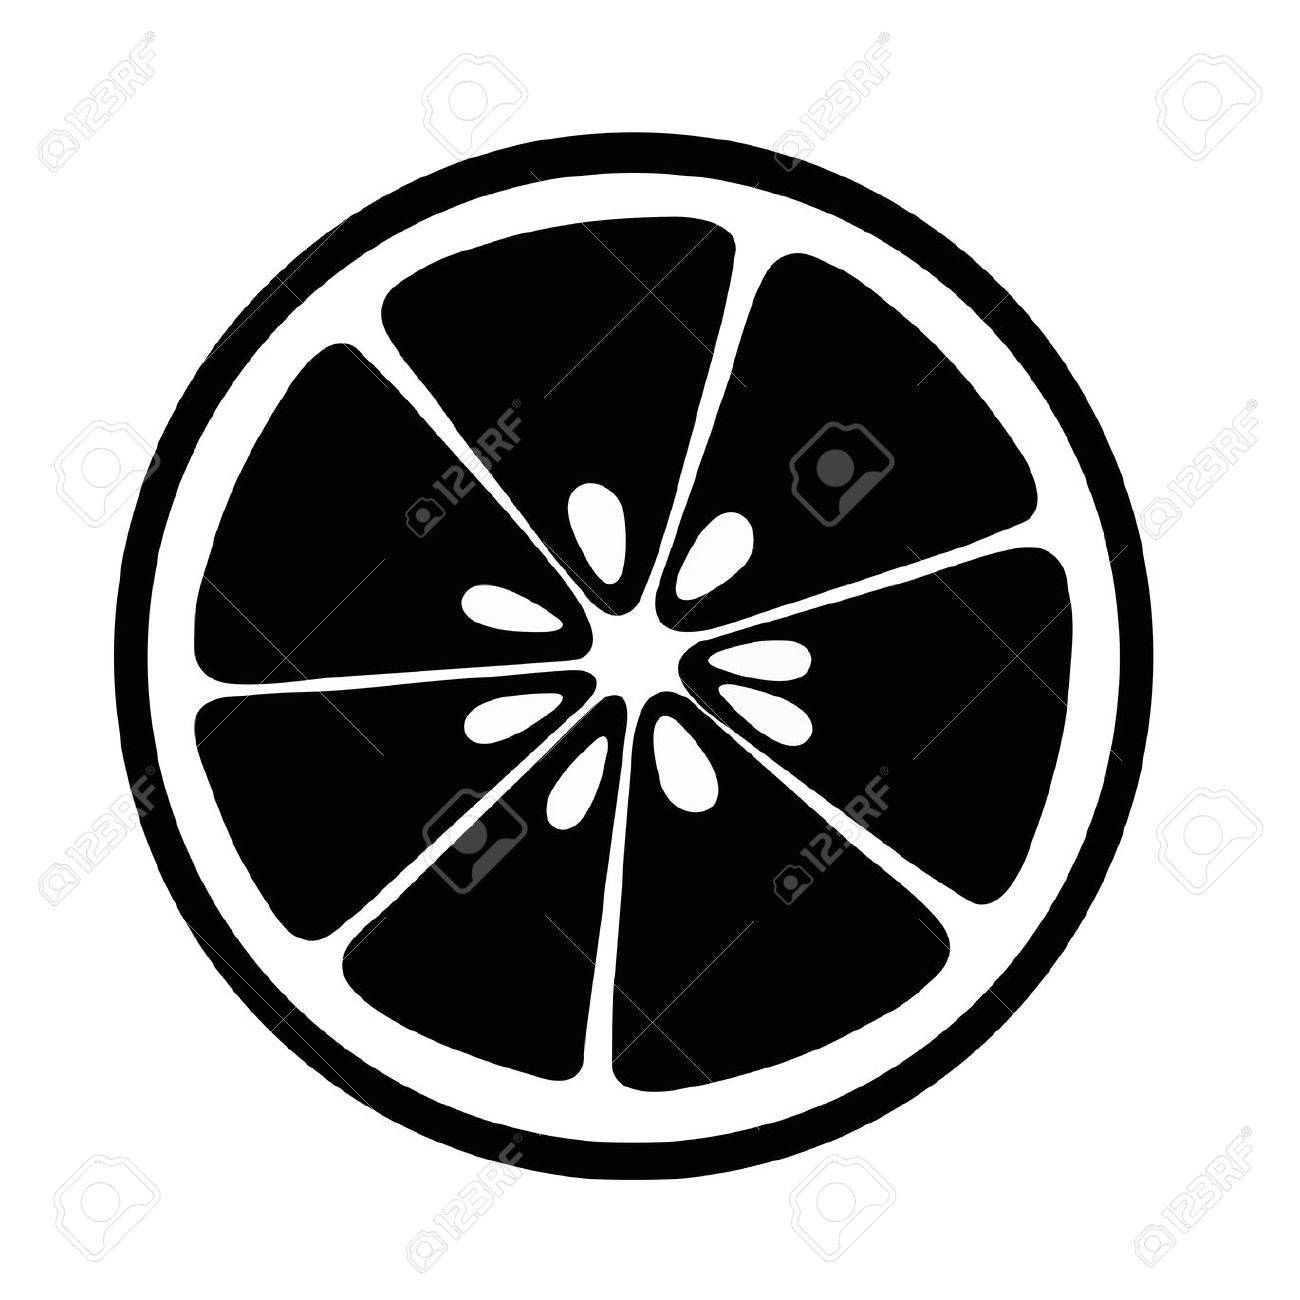 Citrus Slices Lemon Lime And Grapefruit Black Isolated On White Background Stock Vector